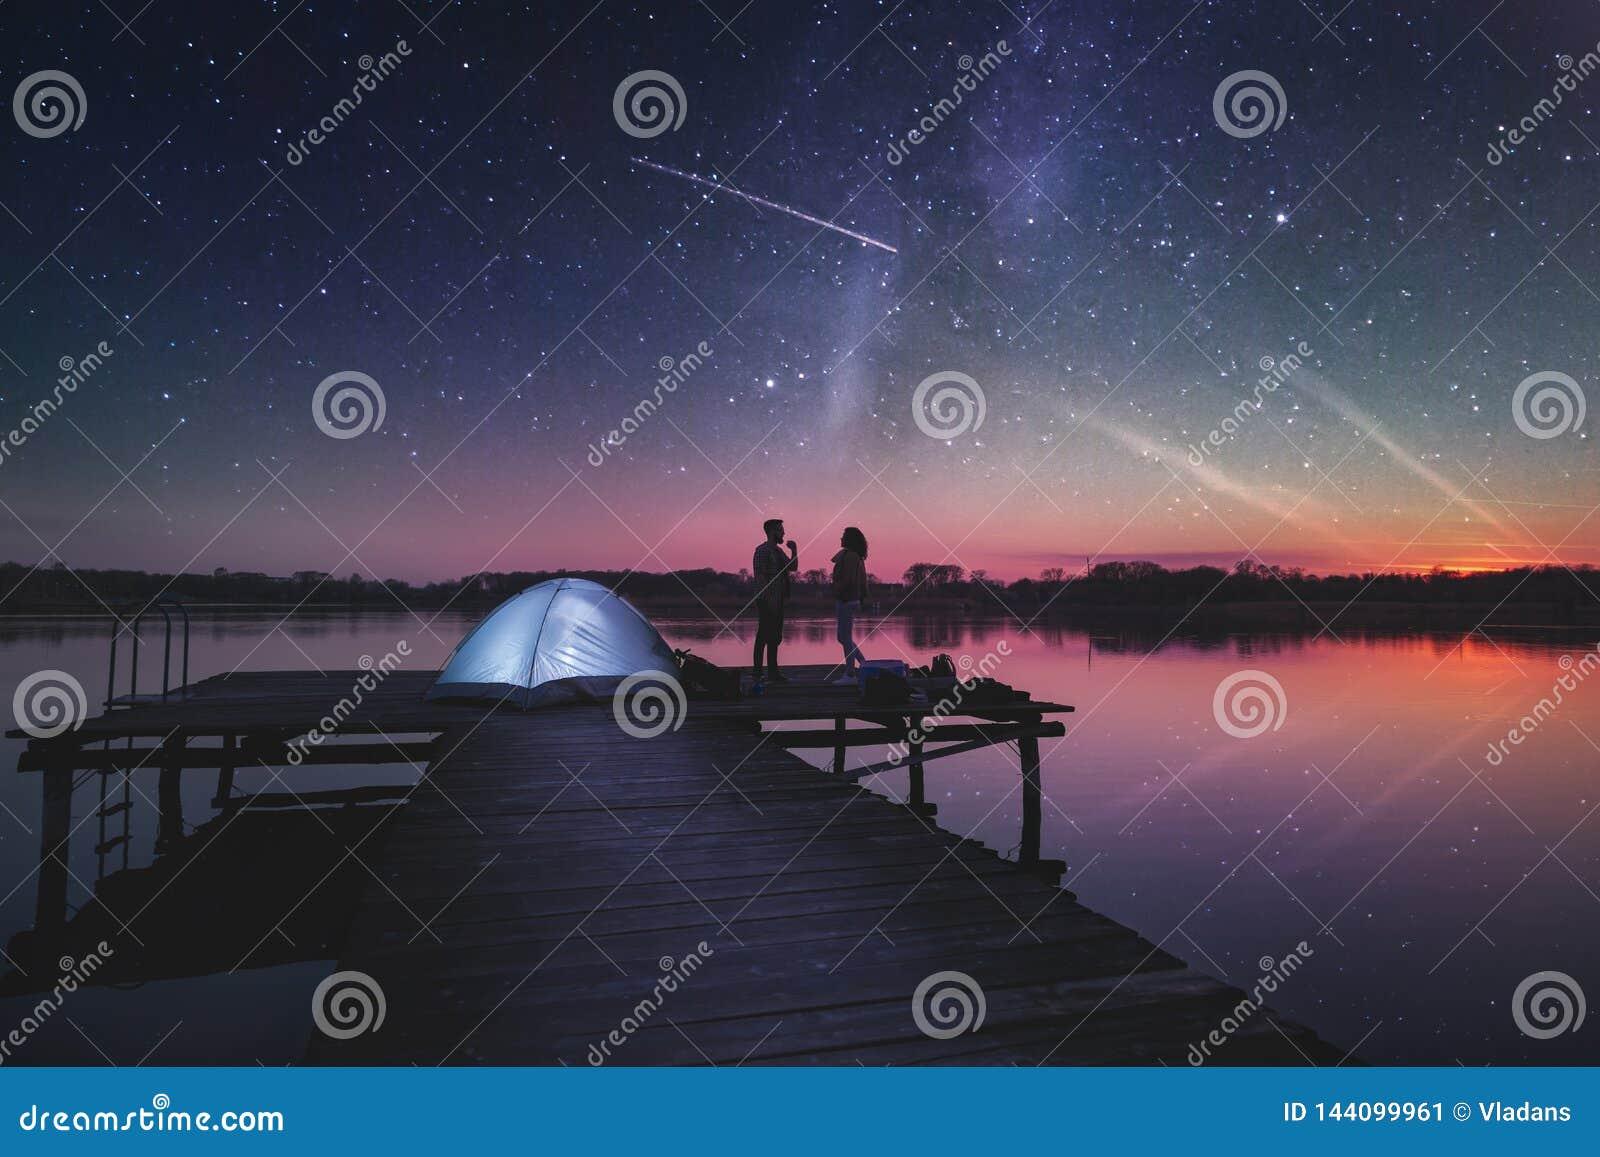 Night camping on the lake